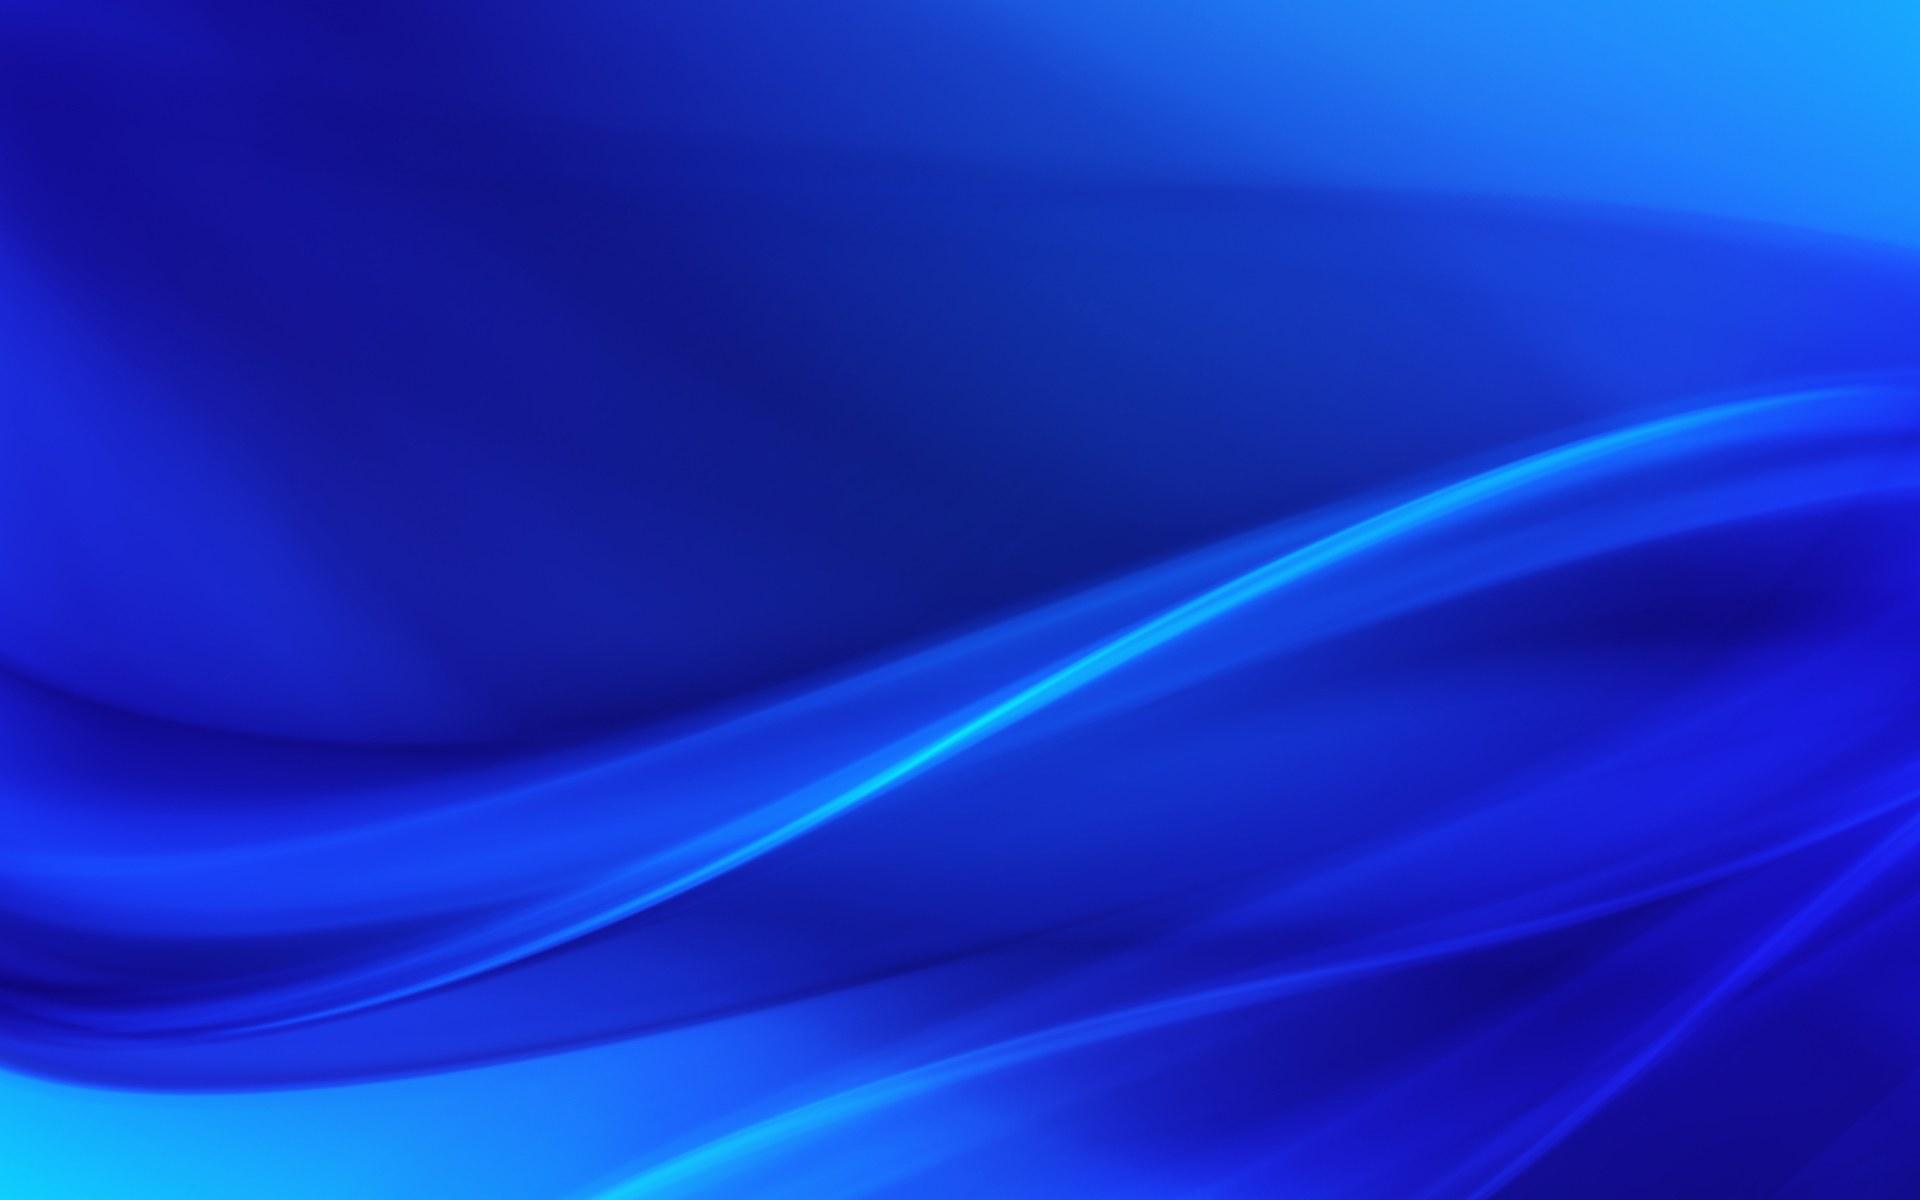 Art Blue Color Wallpaper HD 1855 Wallpaper High Resolution 1920x1200